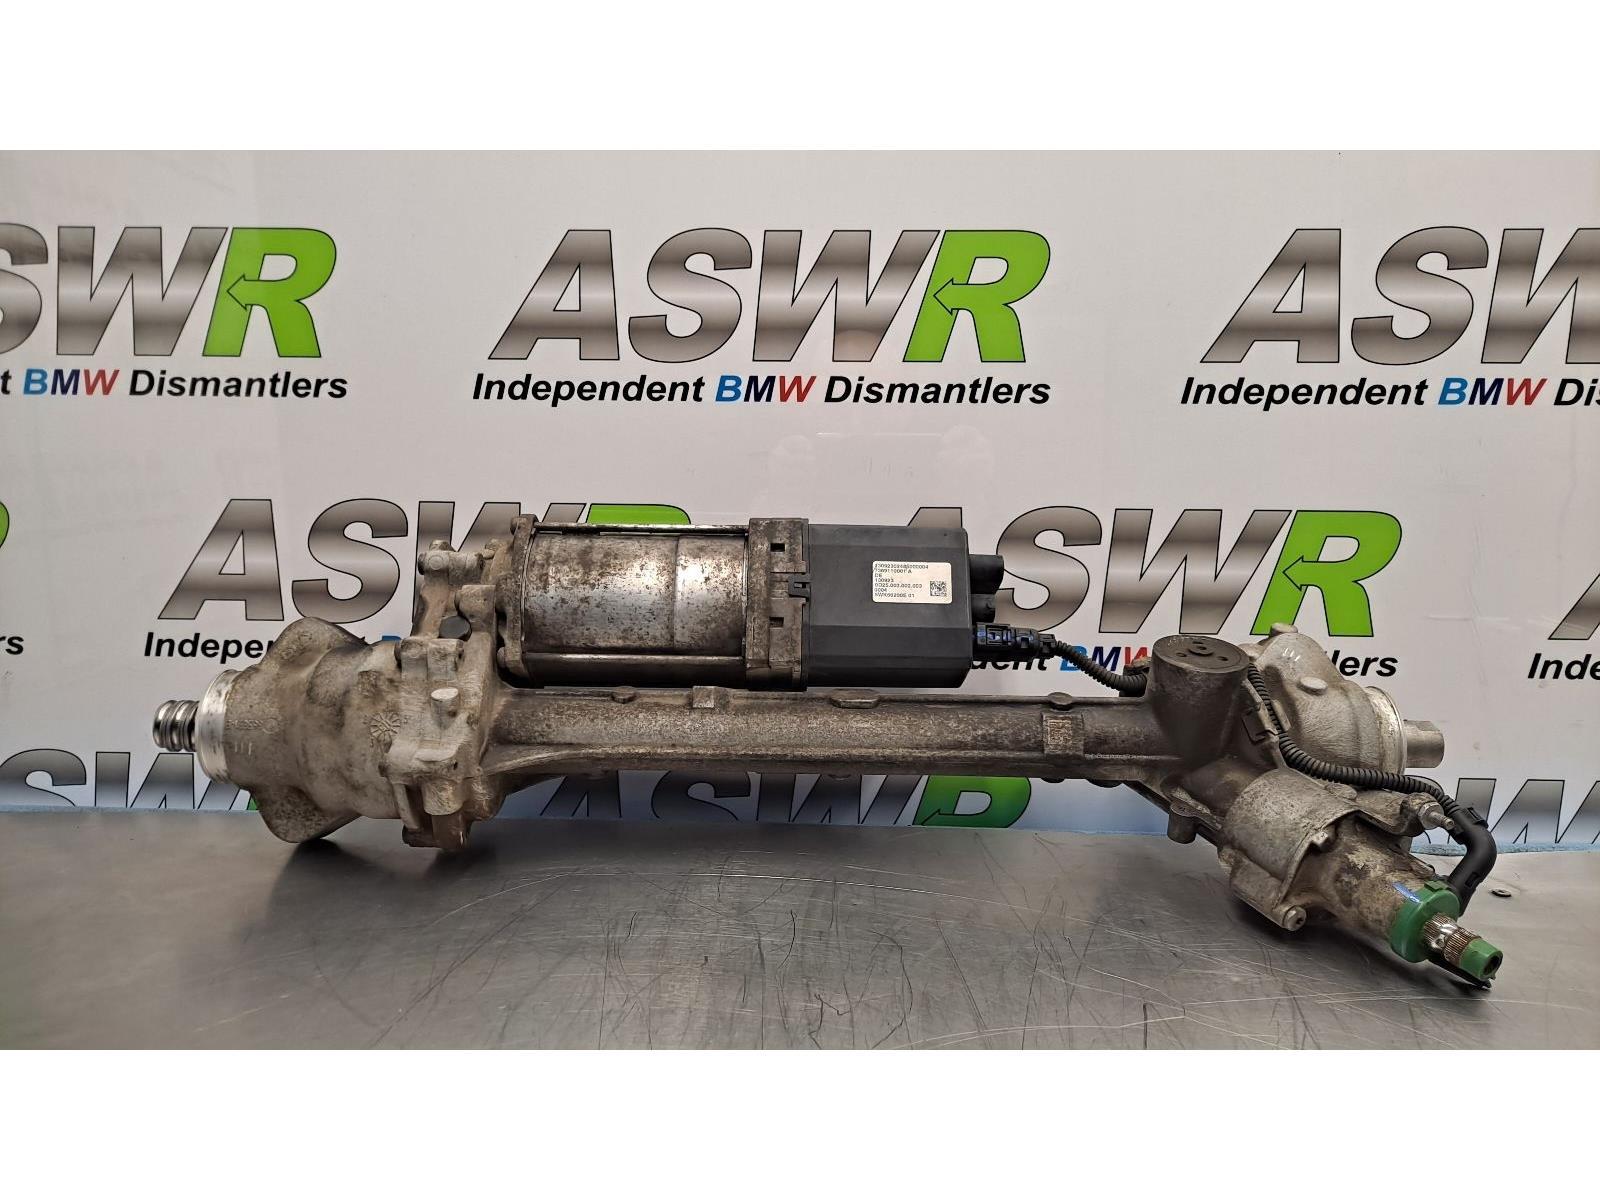 BMW F25 X3 Electric Power Steering Rack 32106889090 3 Month Warranty